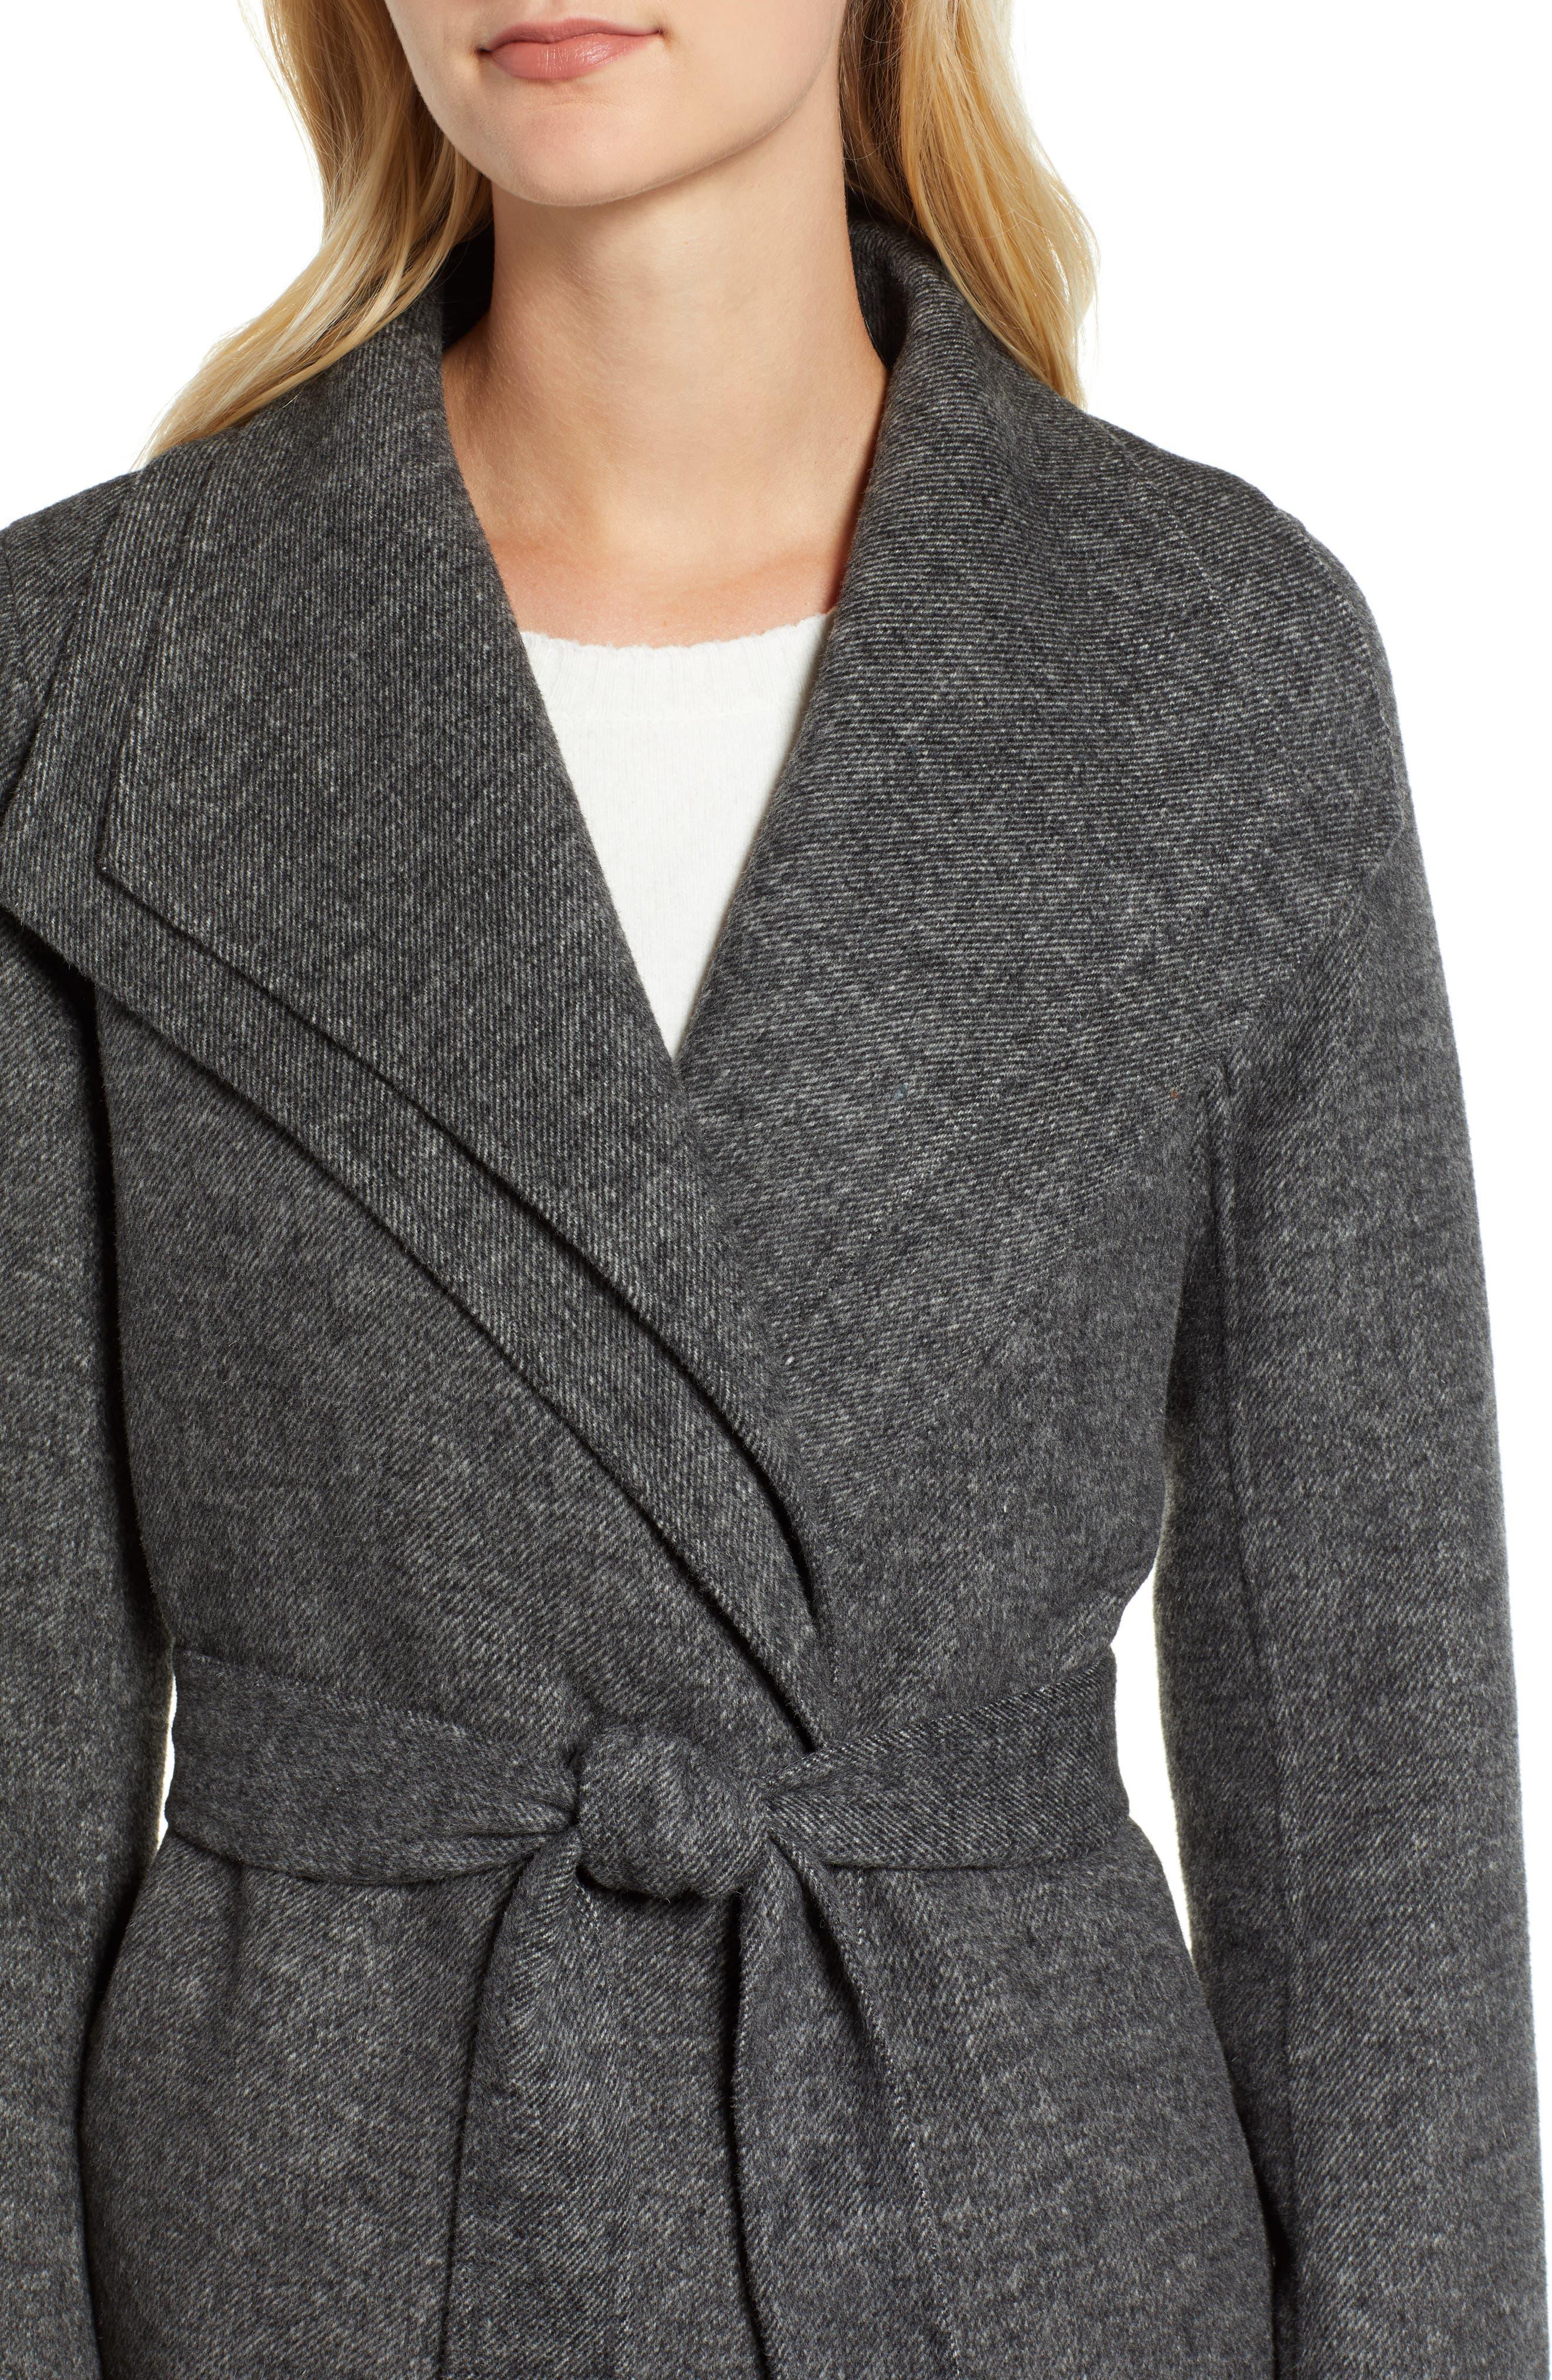 Elliot Wool Blend Wrap Coat,                             Alternate thumbnail 4, color,                             022